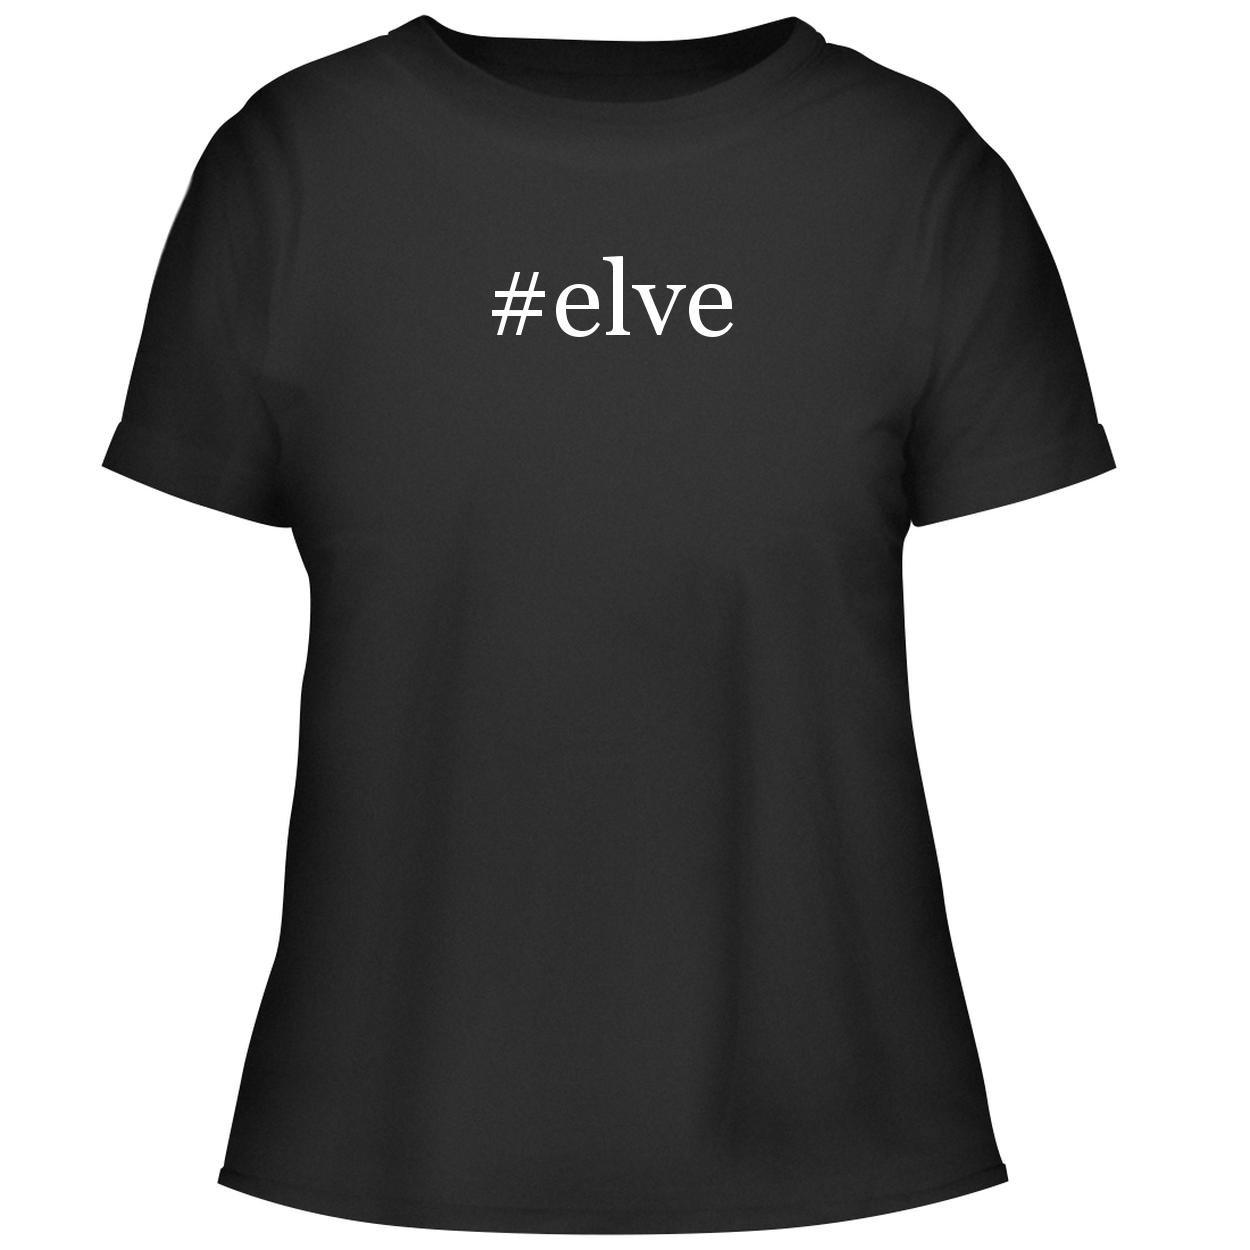 Elve Cute Graphic Tee 3405 Shirts